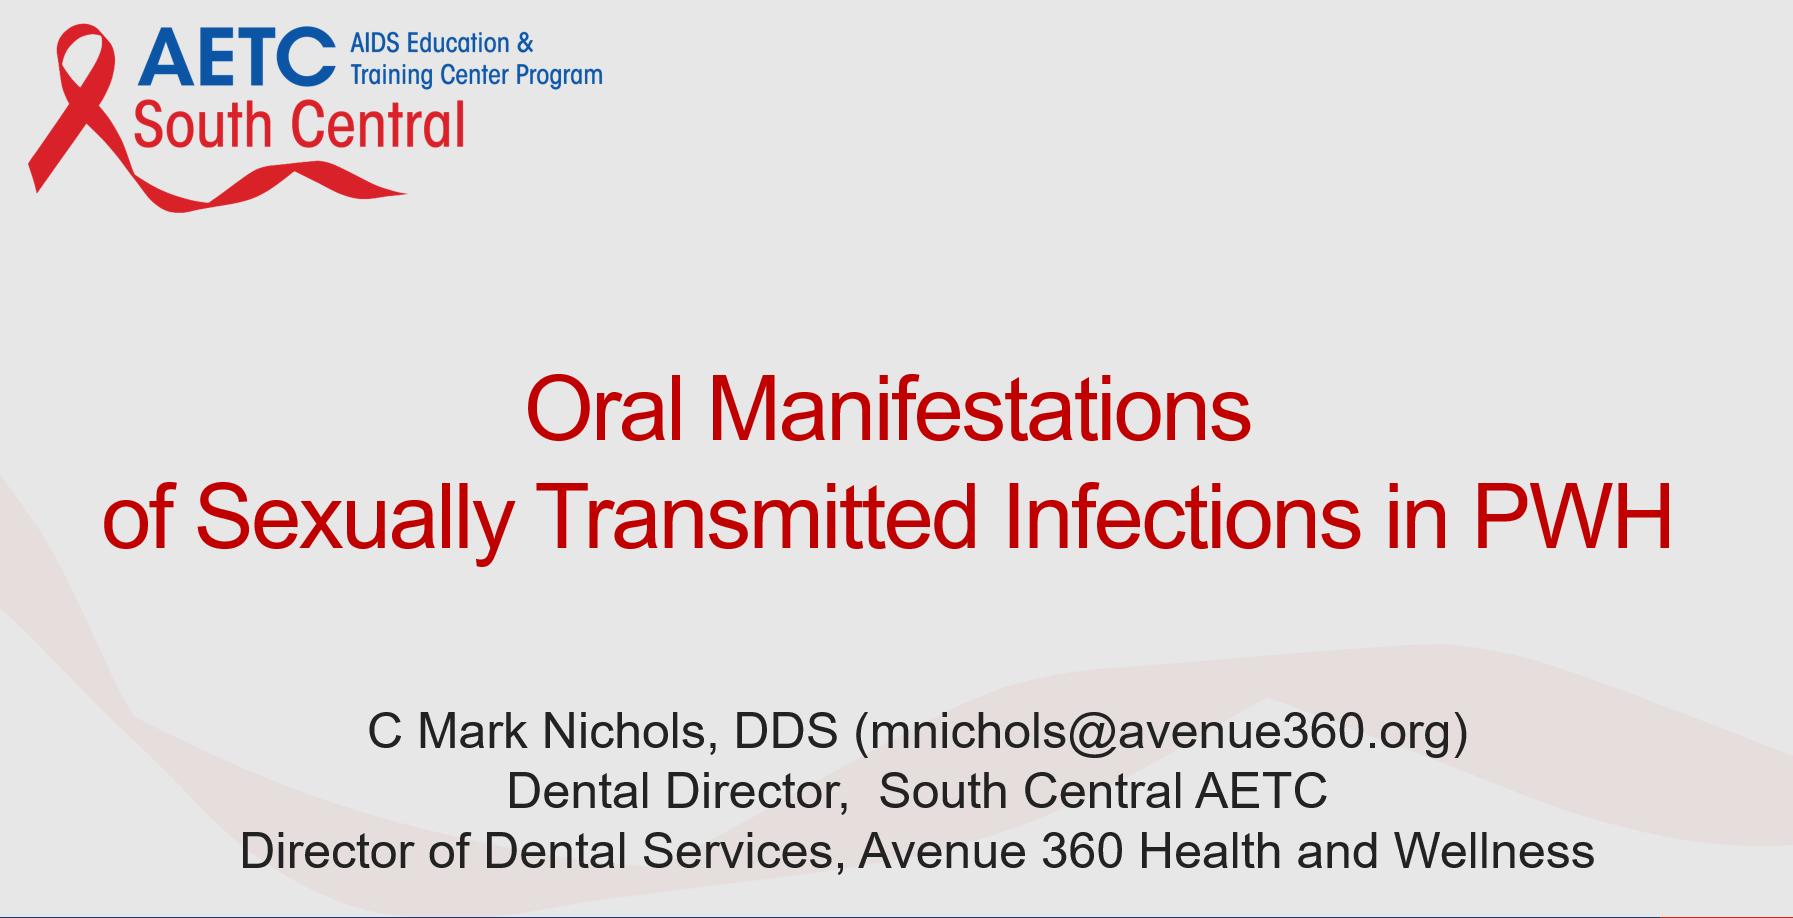 Thumbnail image of Google Slides Presentation of Oral STIs in HIV.